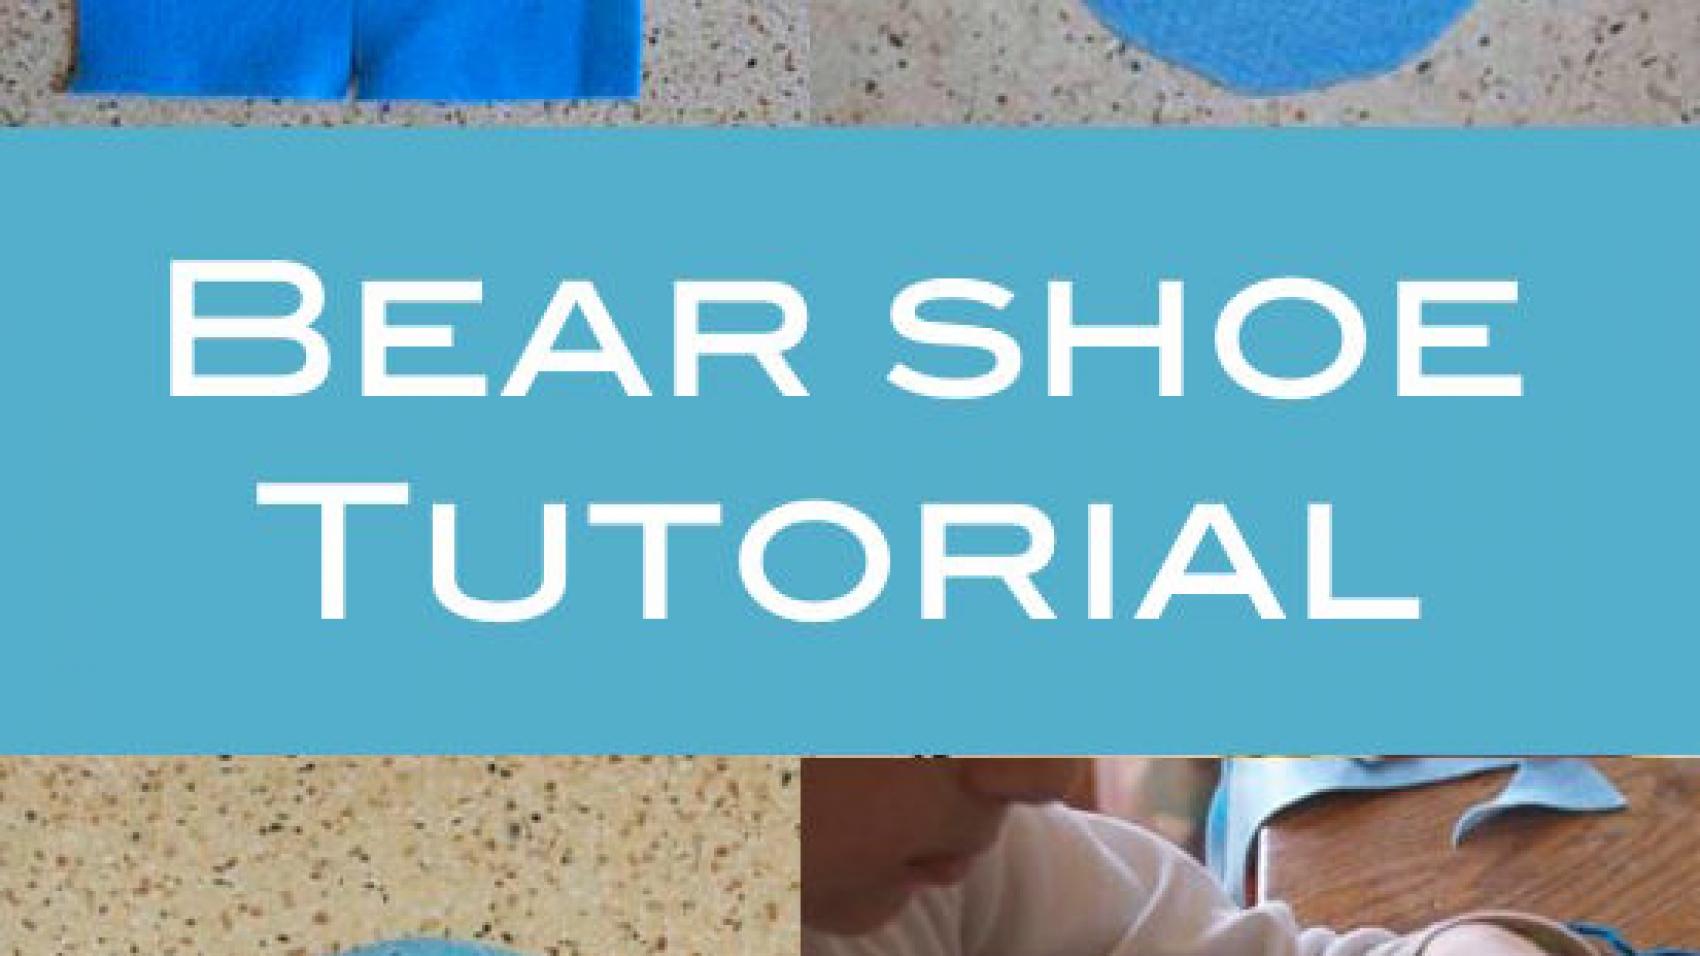 Felt shoe elements as backdrop for text bear shoe tutorial